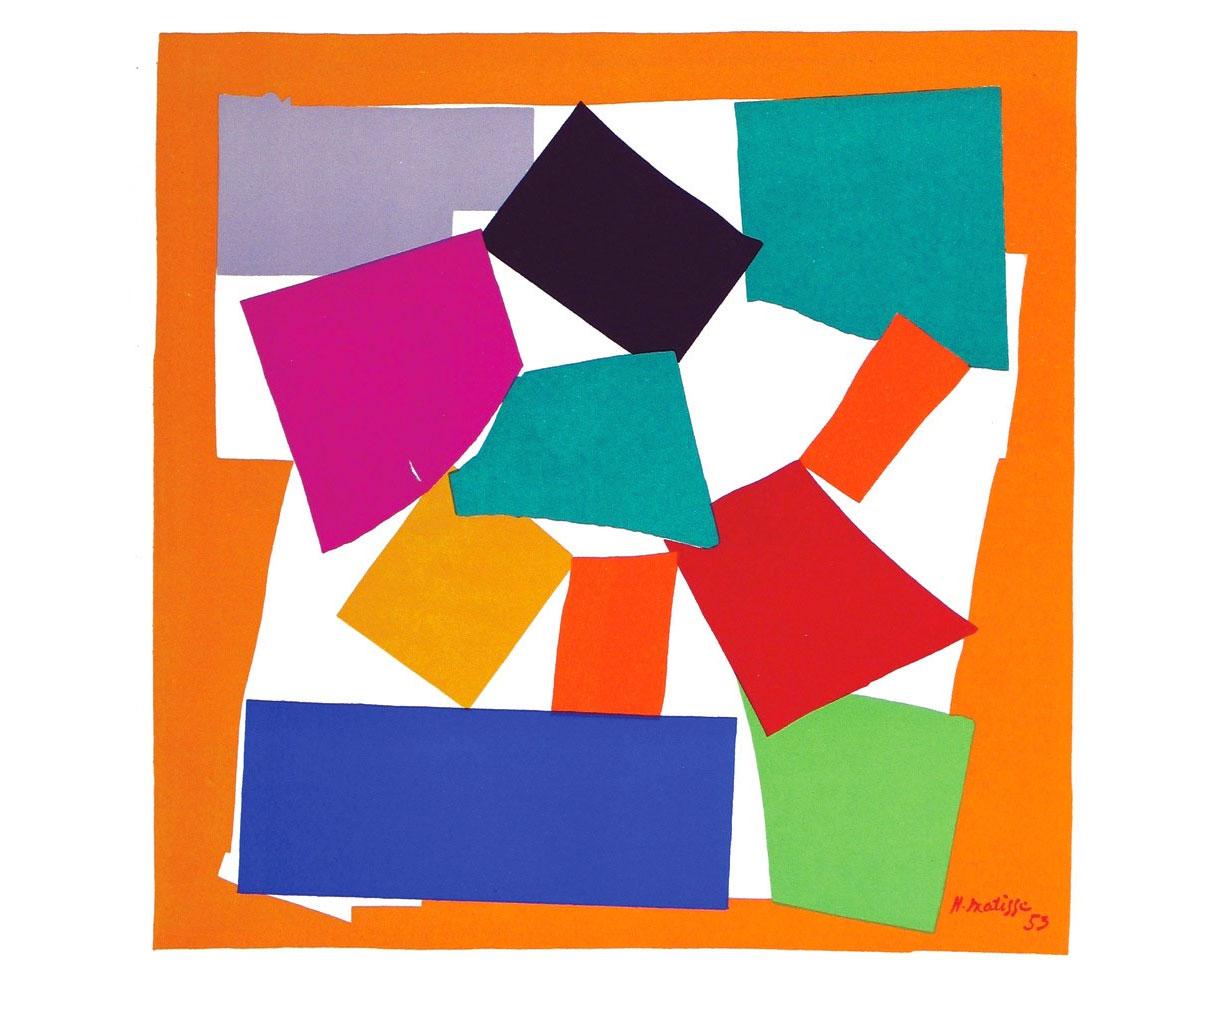 Henri Matisse, La lumaca